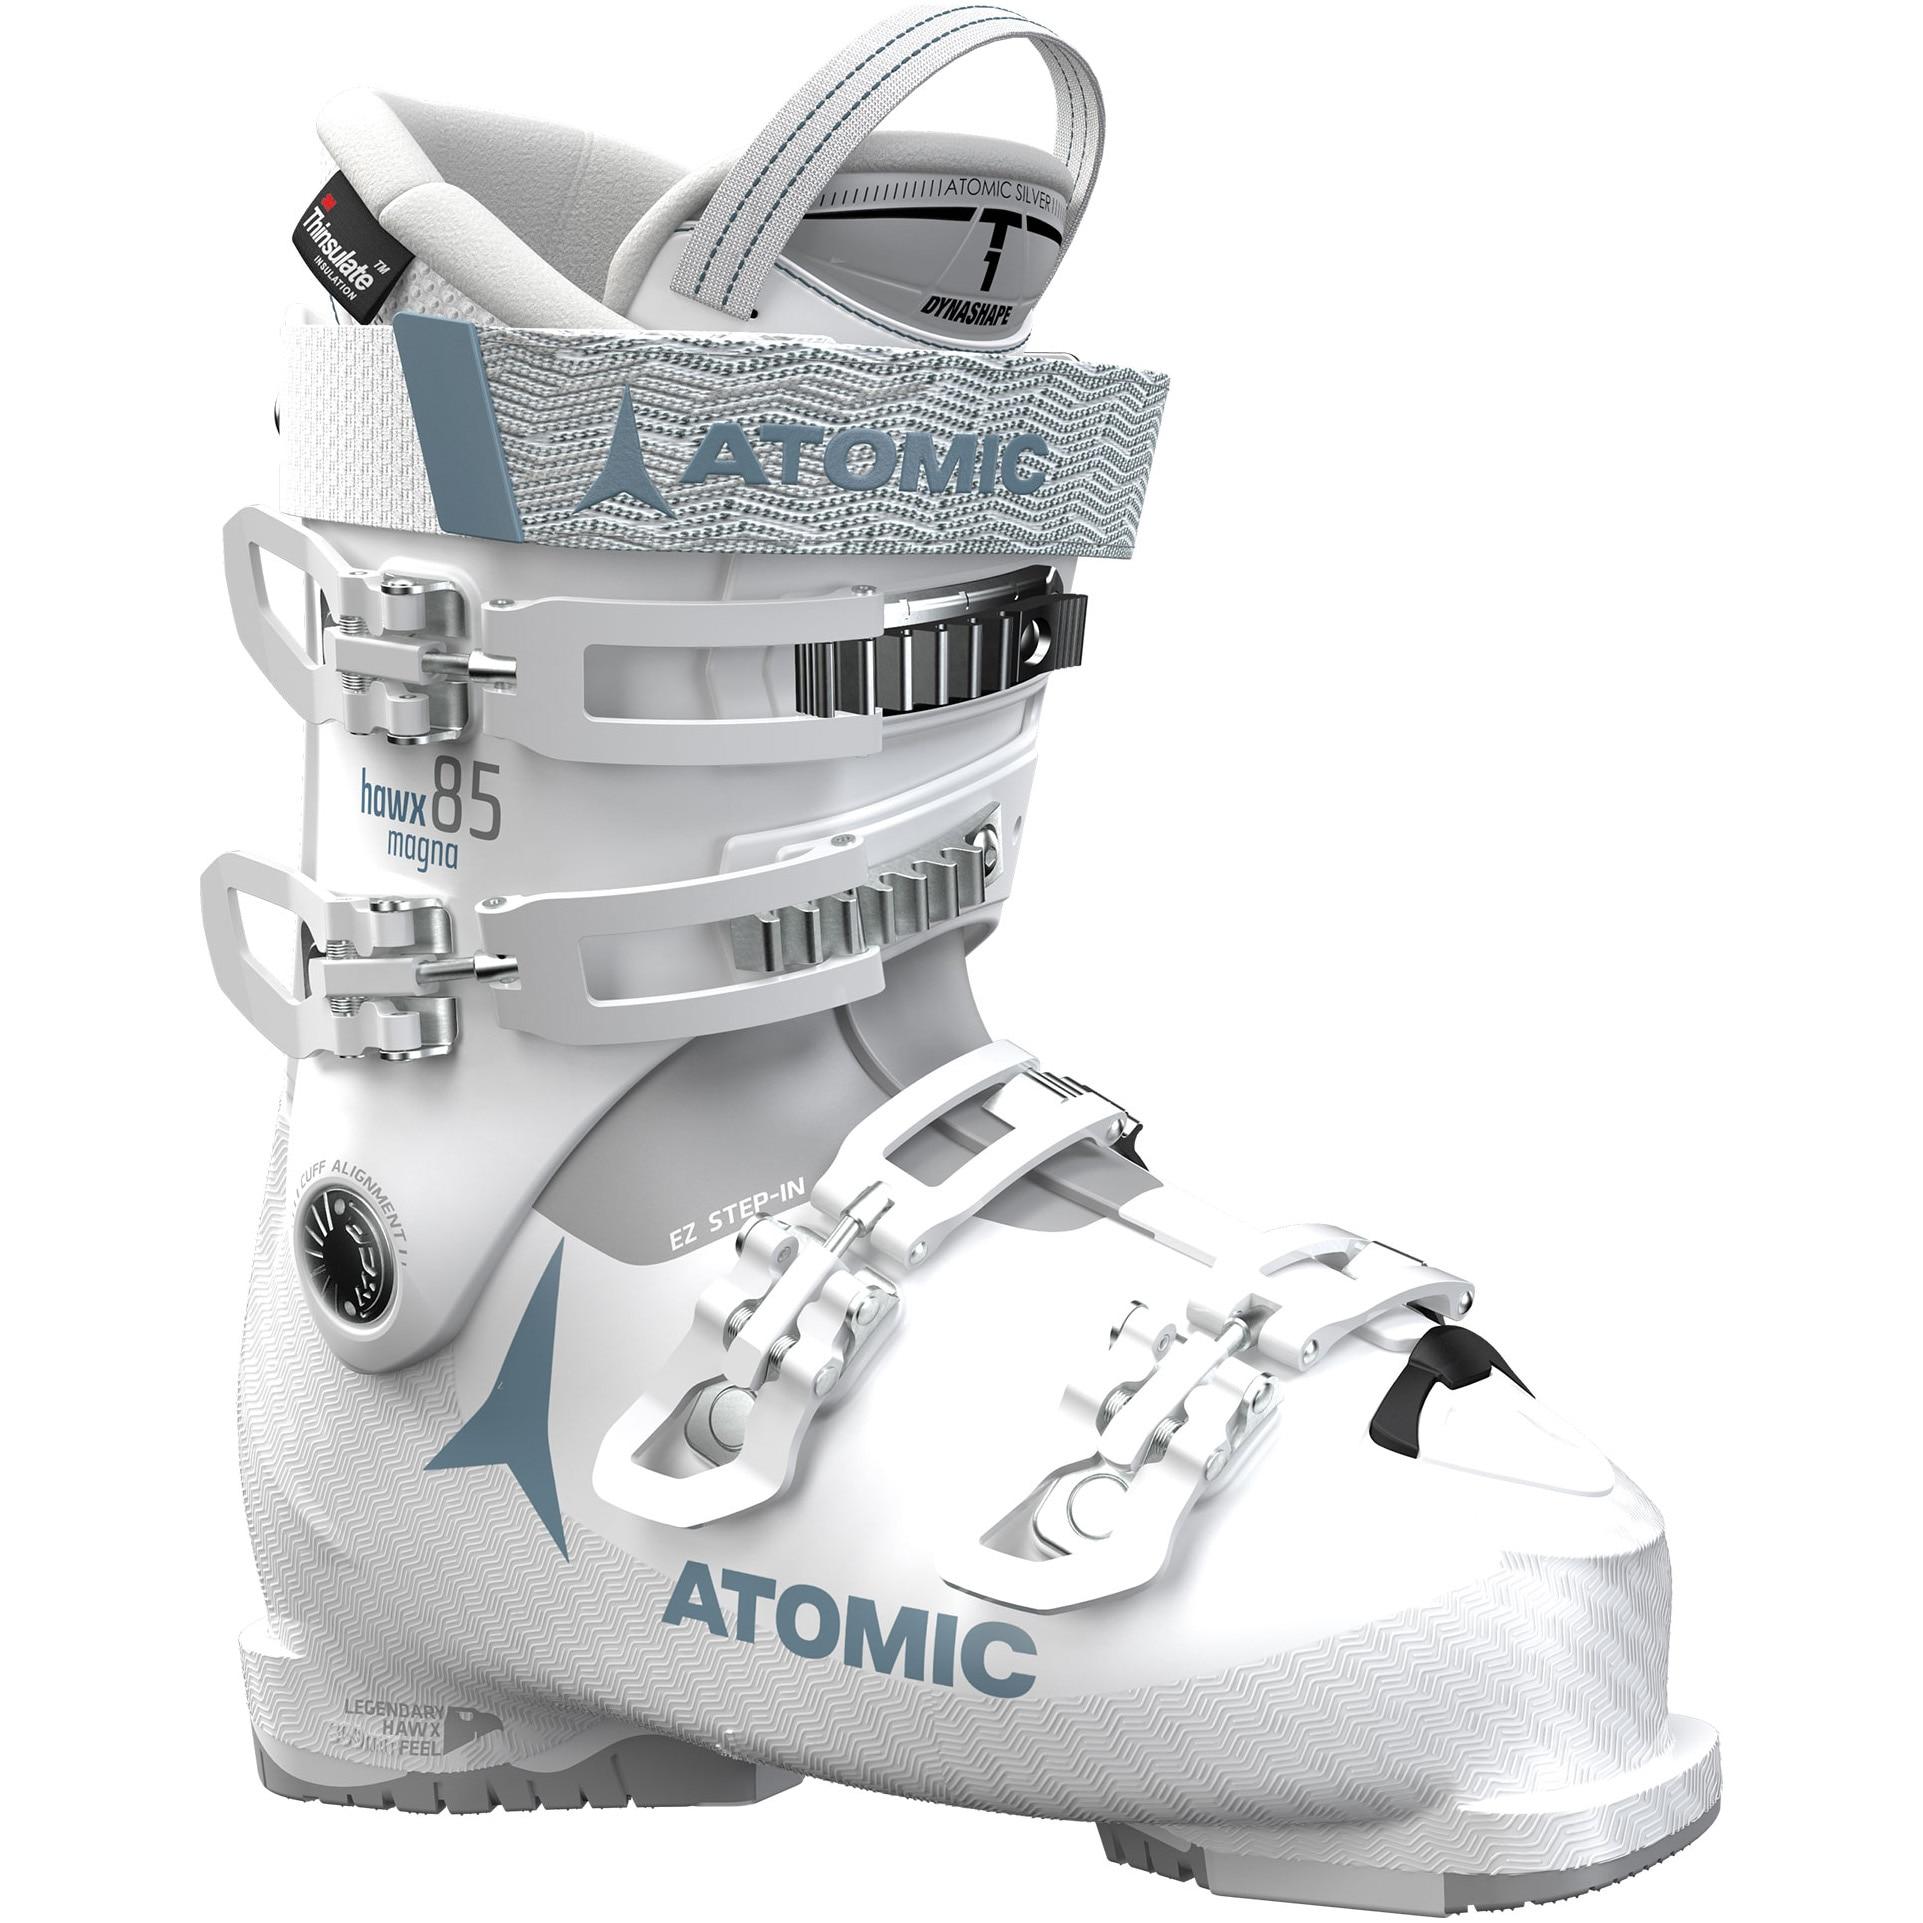 Fotografie Clapari Atomic Hawx Magna 85 W, White/Light Grey, White/Light Grey, 25, 25.5